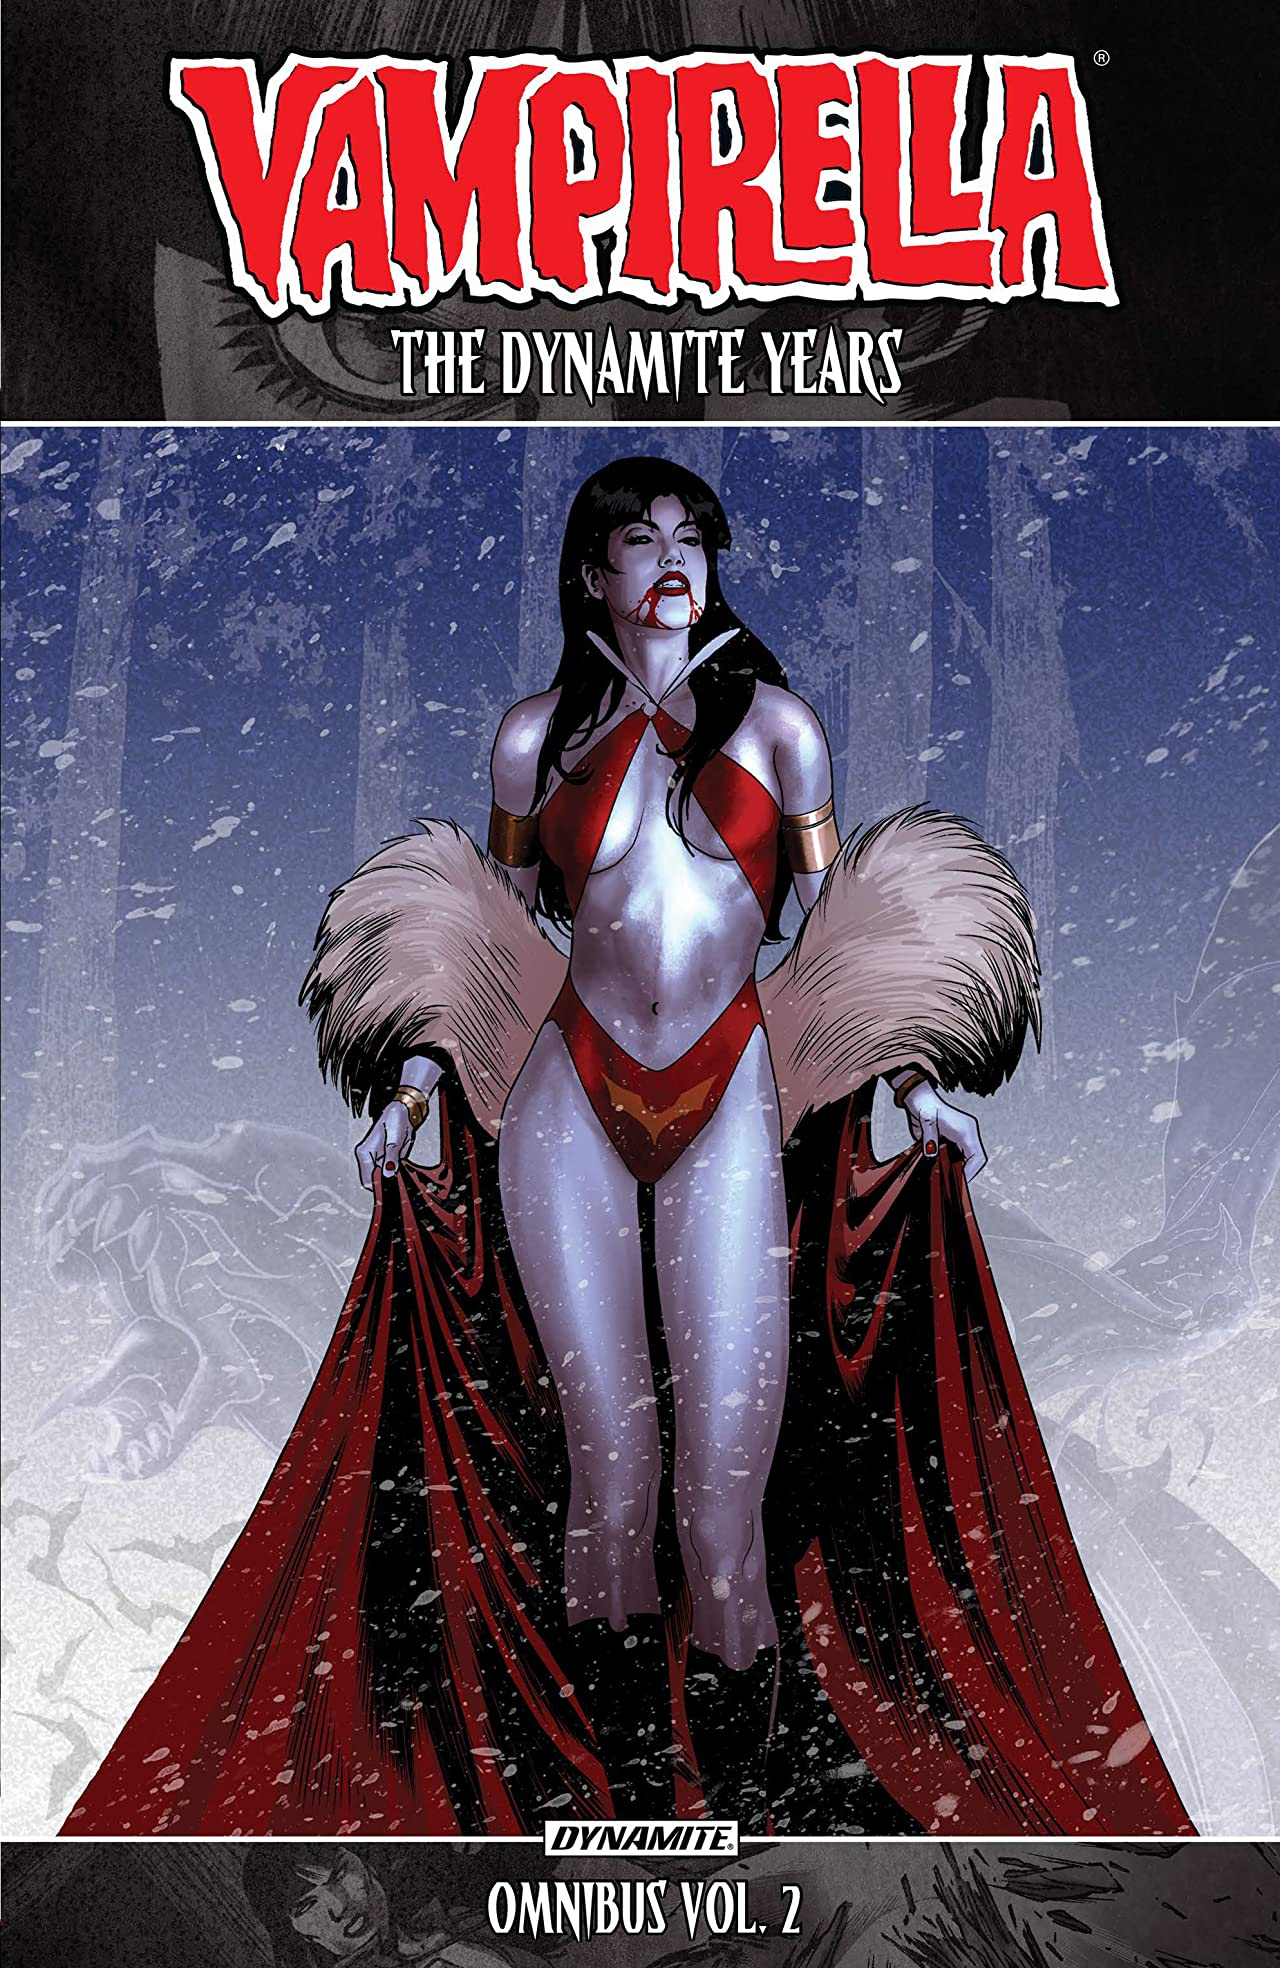 Vampirella: The Dynamite Years Omnibus Vol. 2